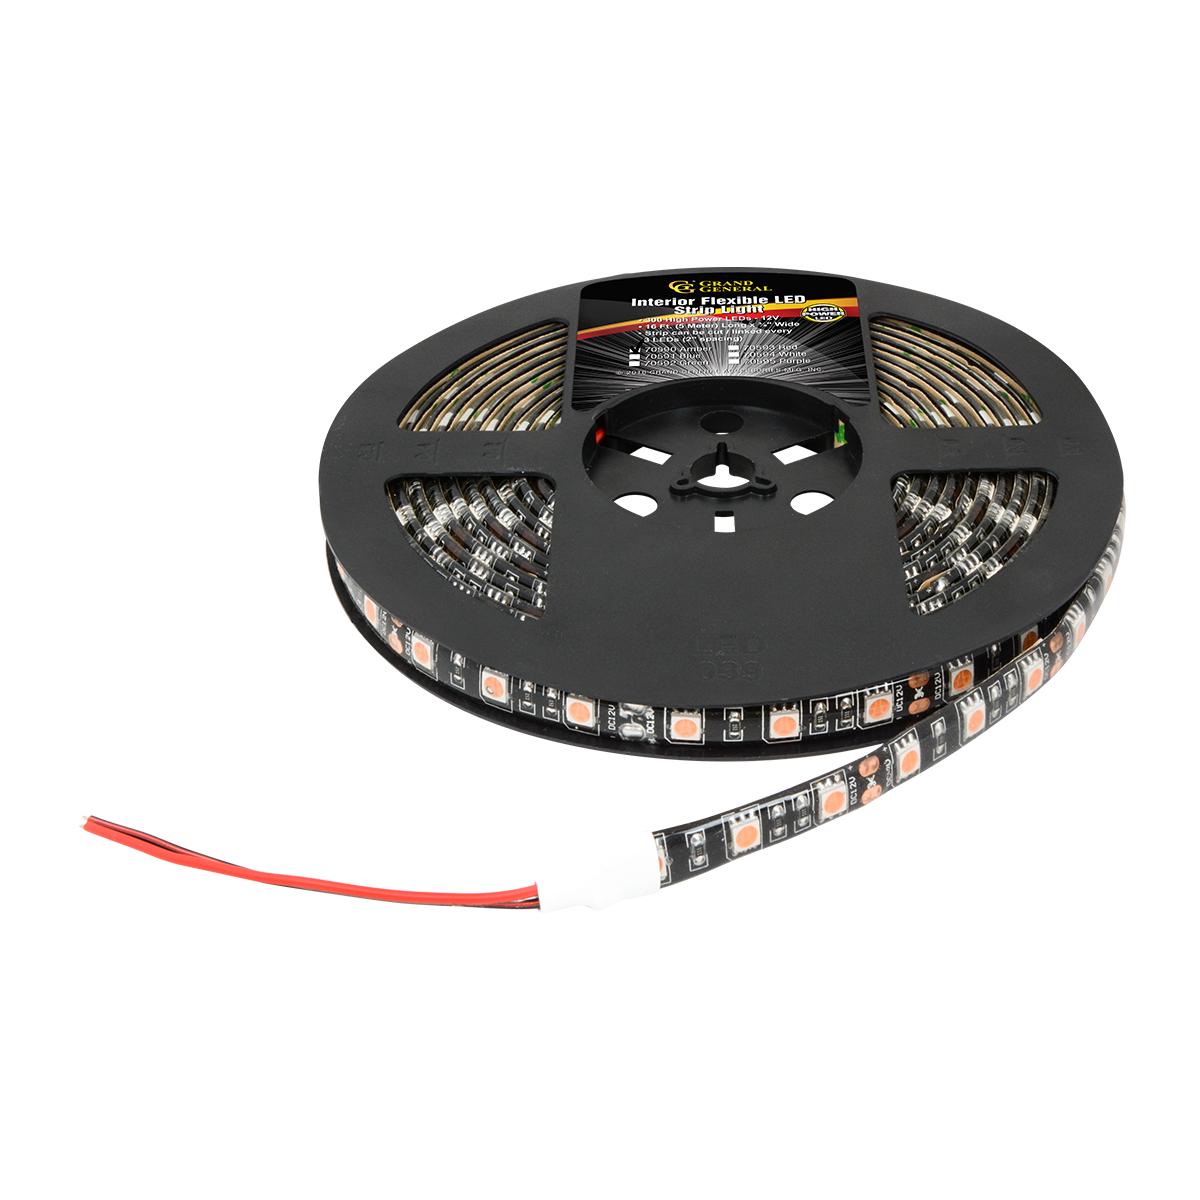 Interior Flexible & Cuttable LED Strip Light